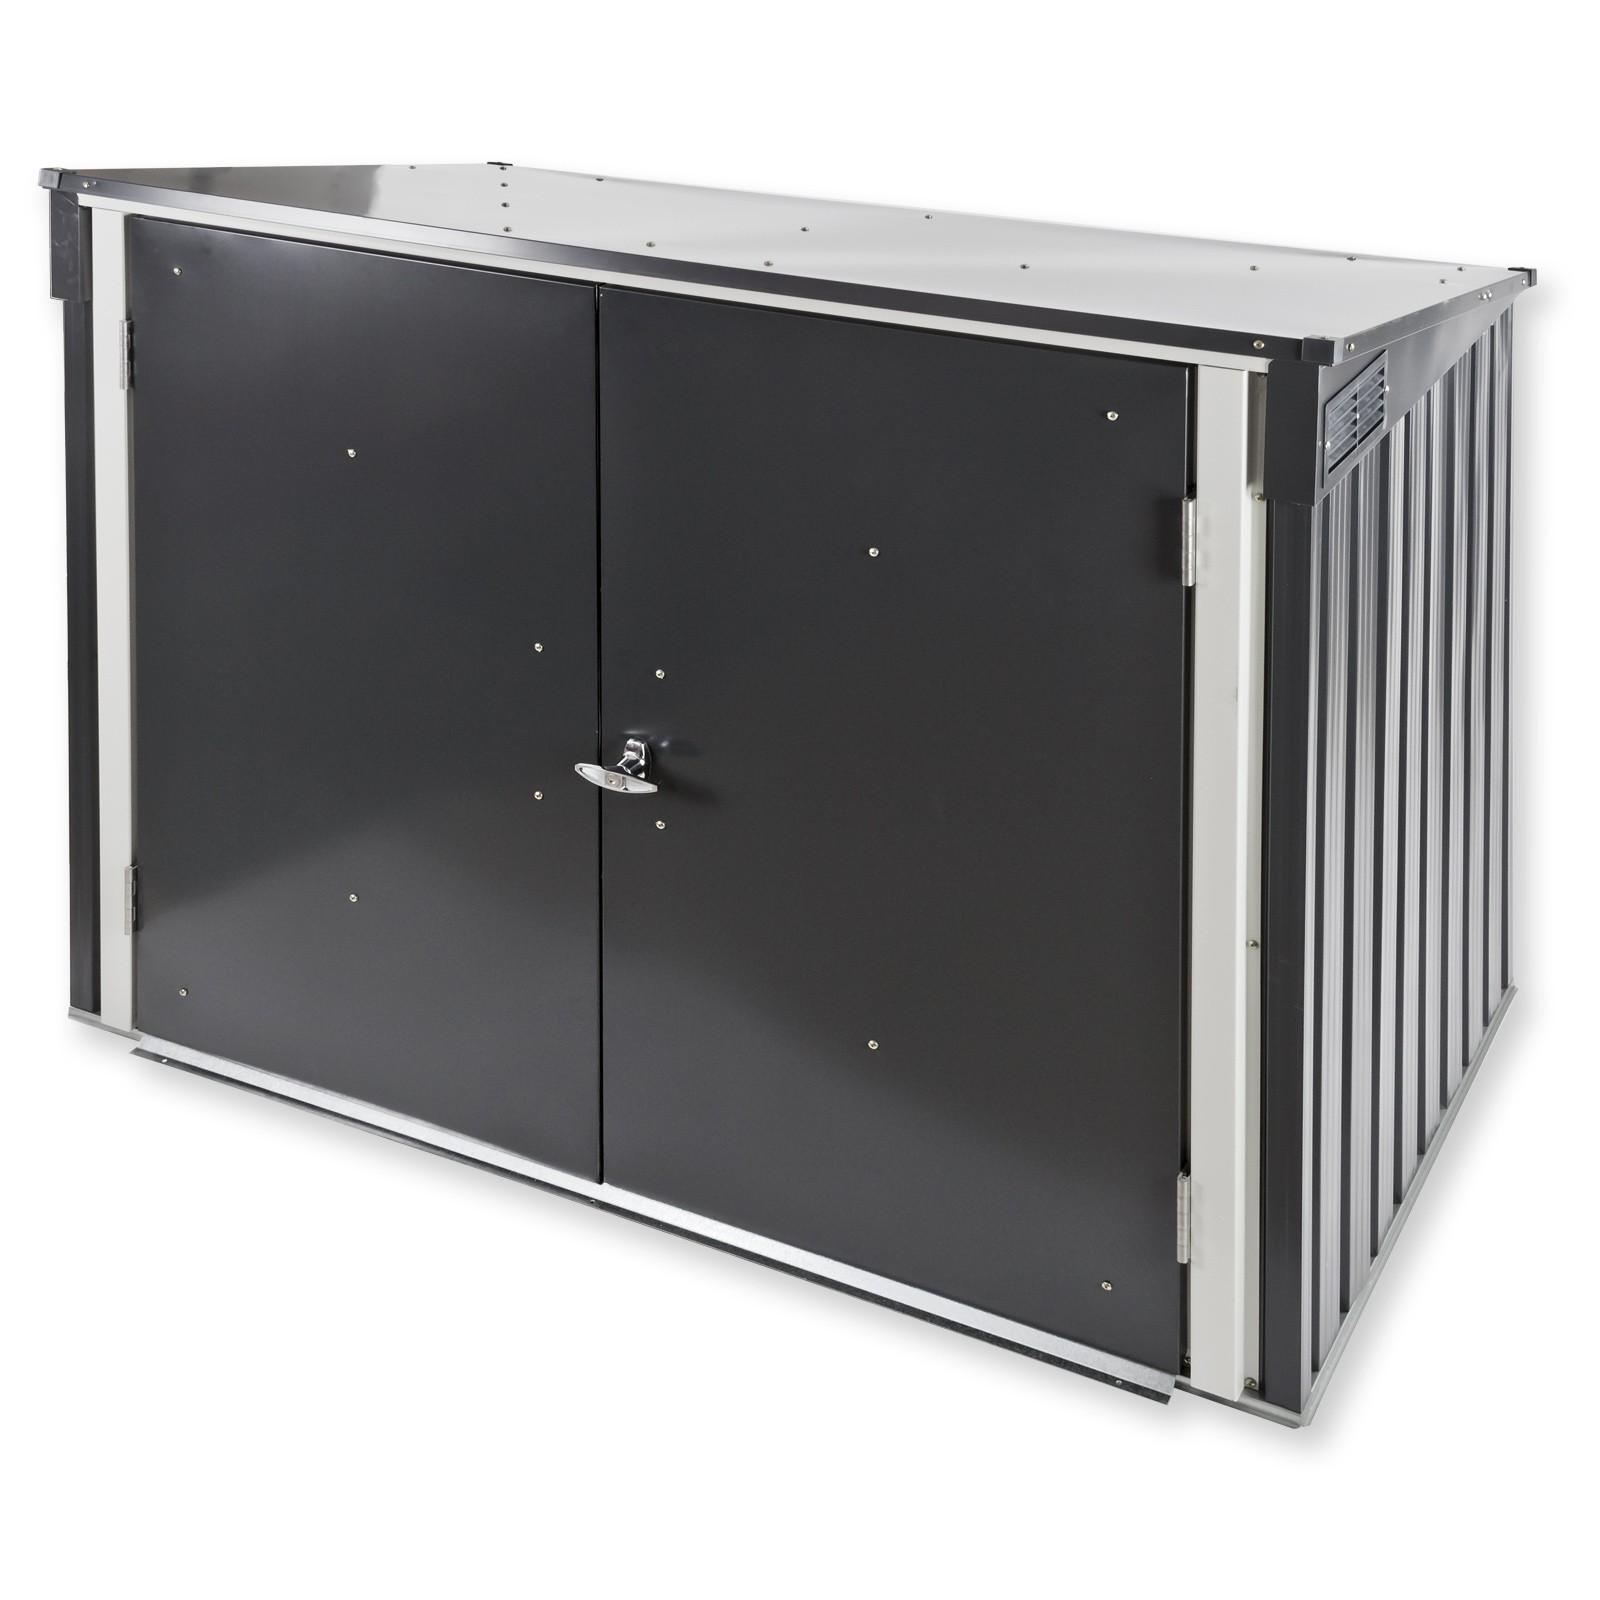 Dema Tepro Metall Mülltonnenbox Gartenbox Müllbox Aufbewahrungsbox 10048